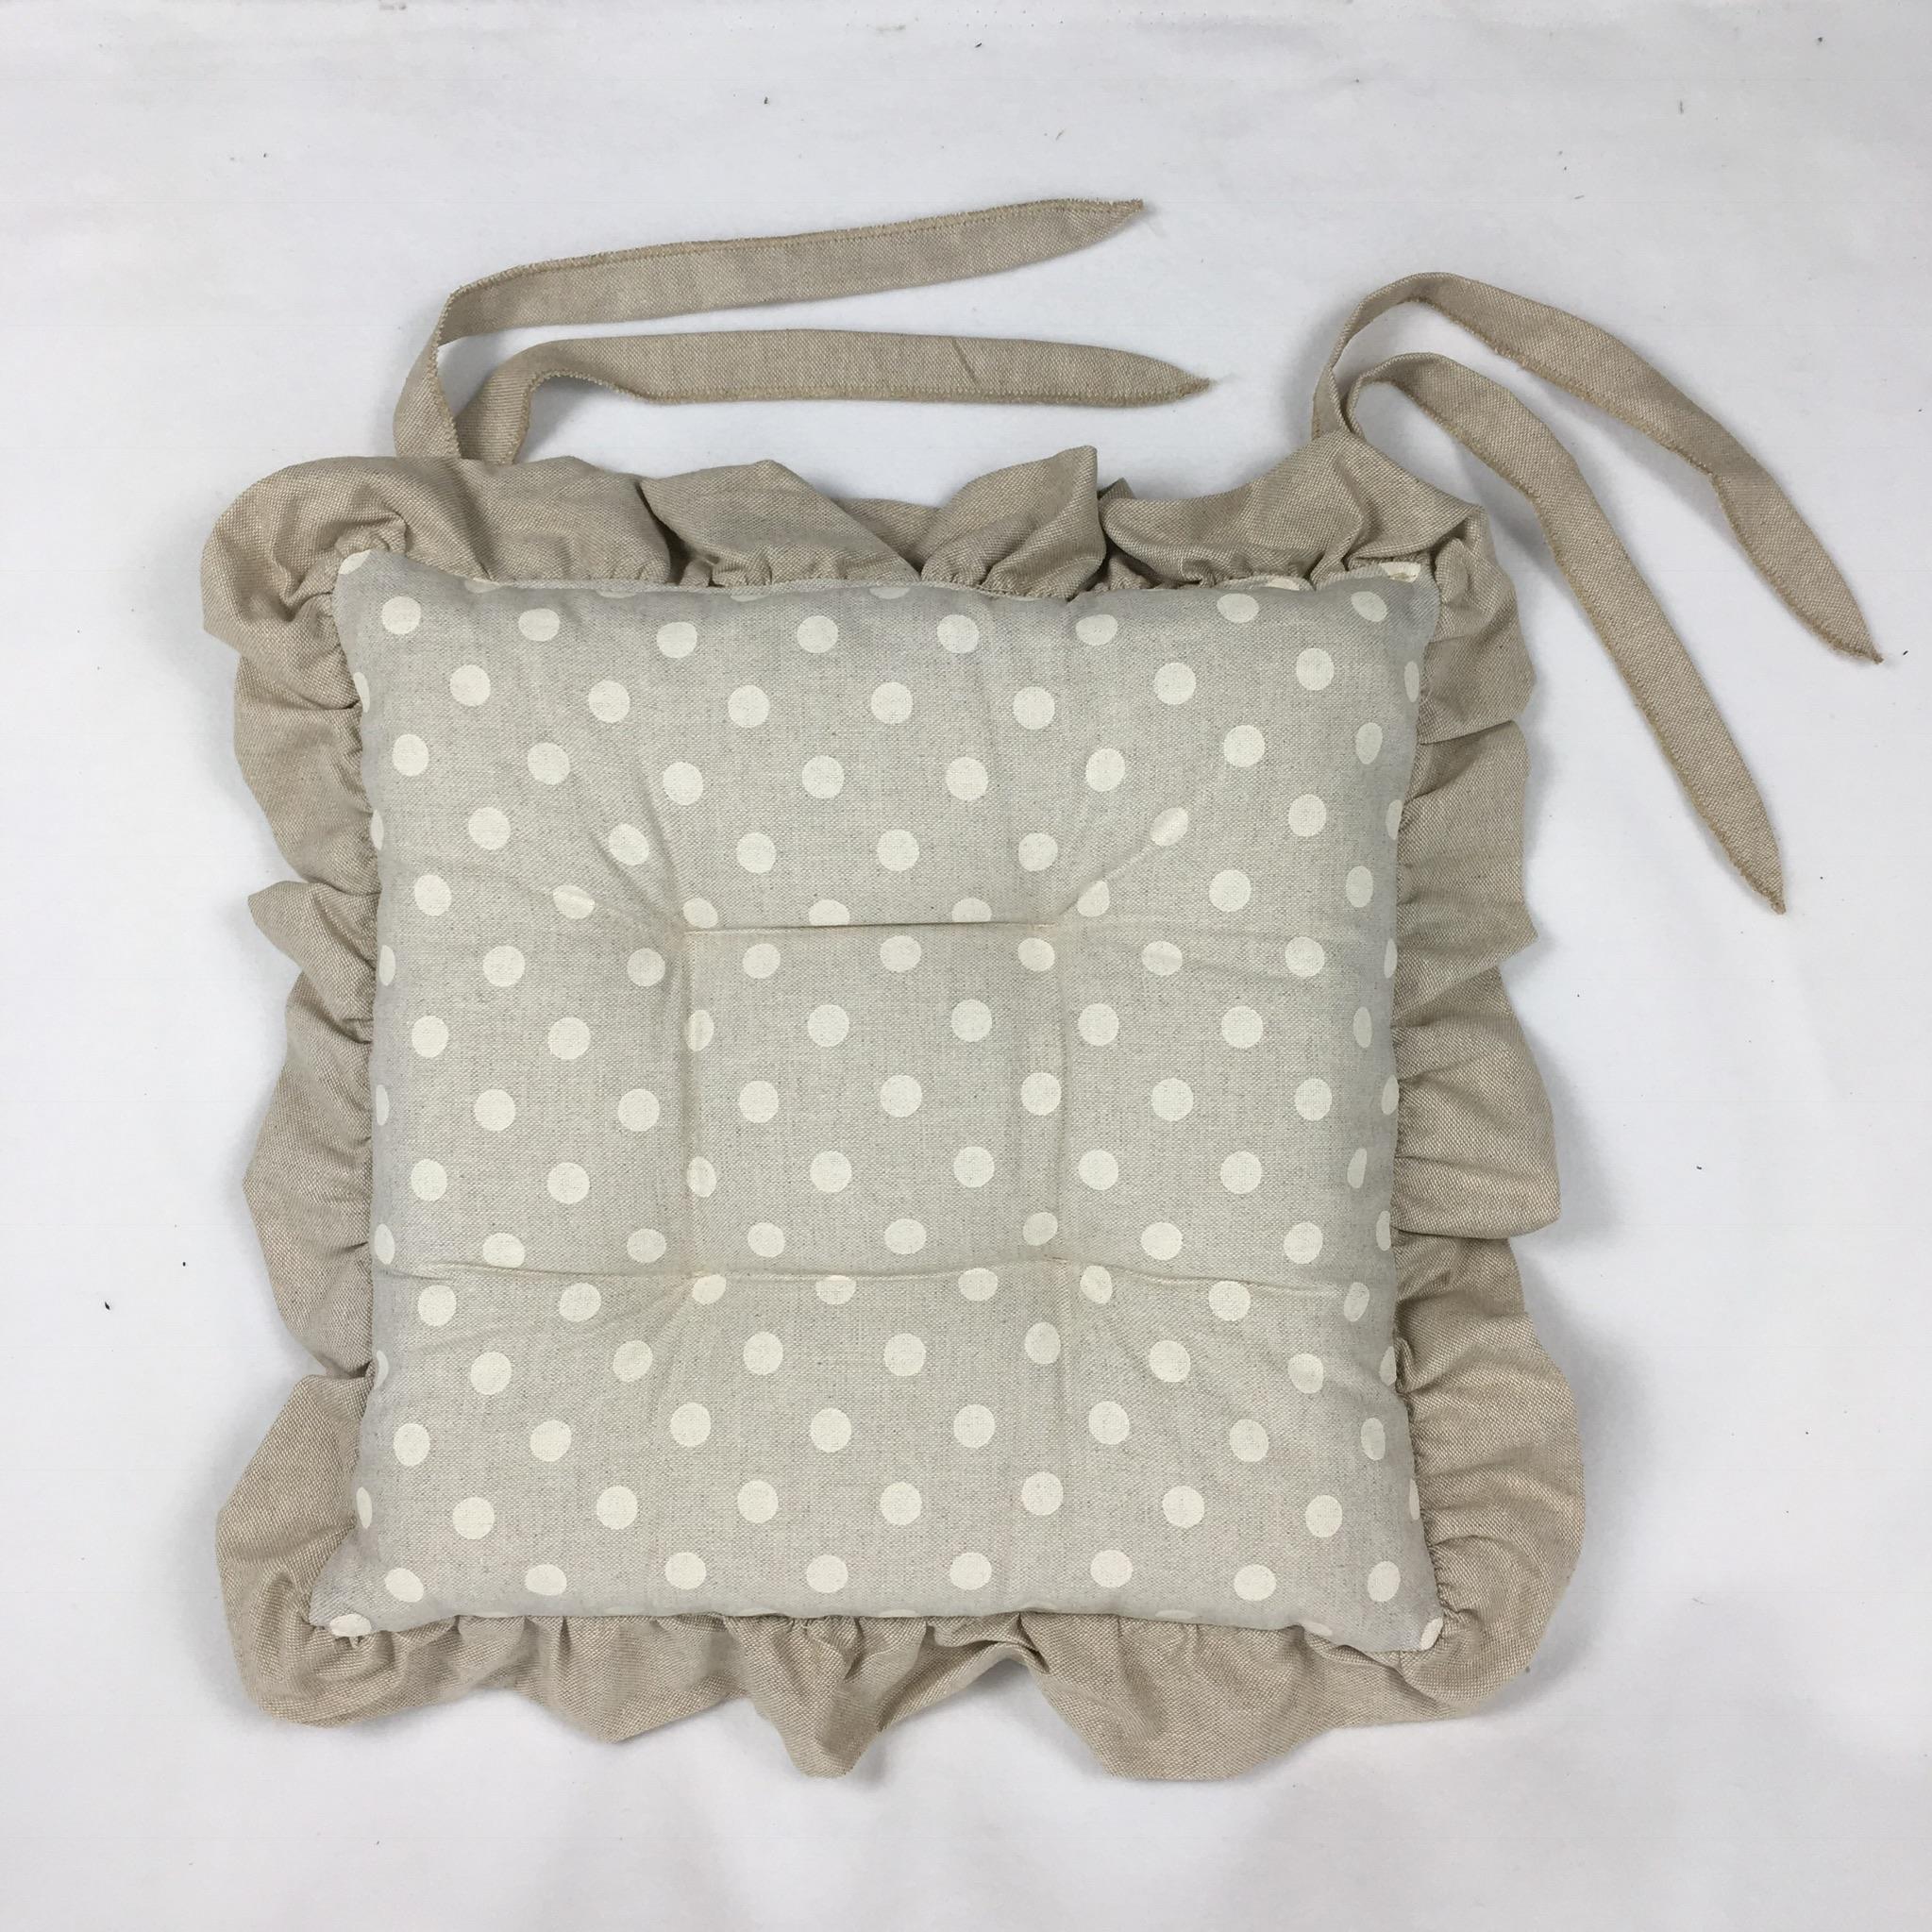 Cuscini Pois.Cuscino Pois Bianco Da Giselda Biancheria Per La Casa Tessuti